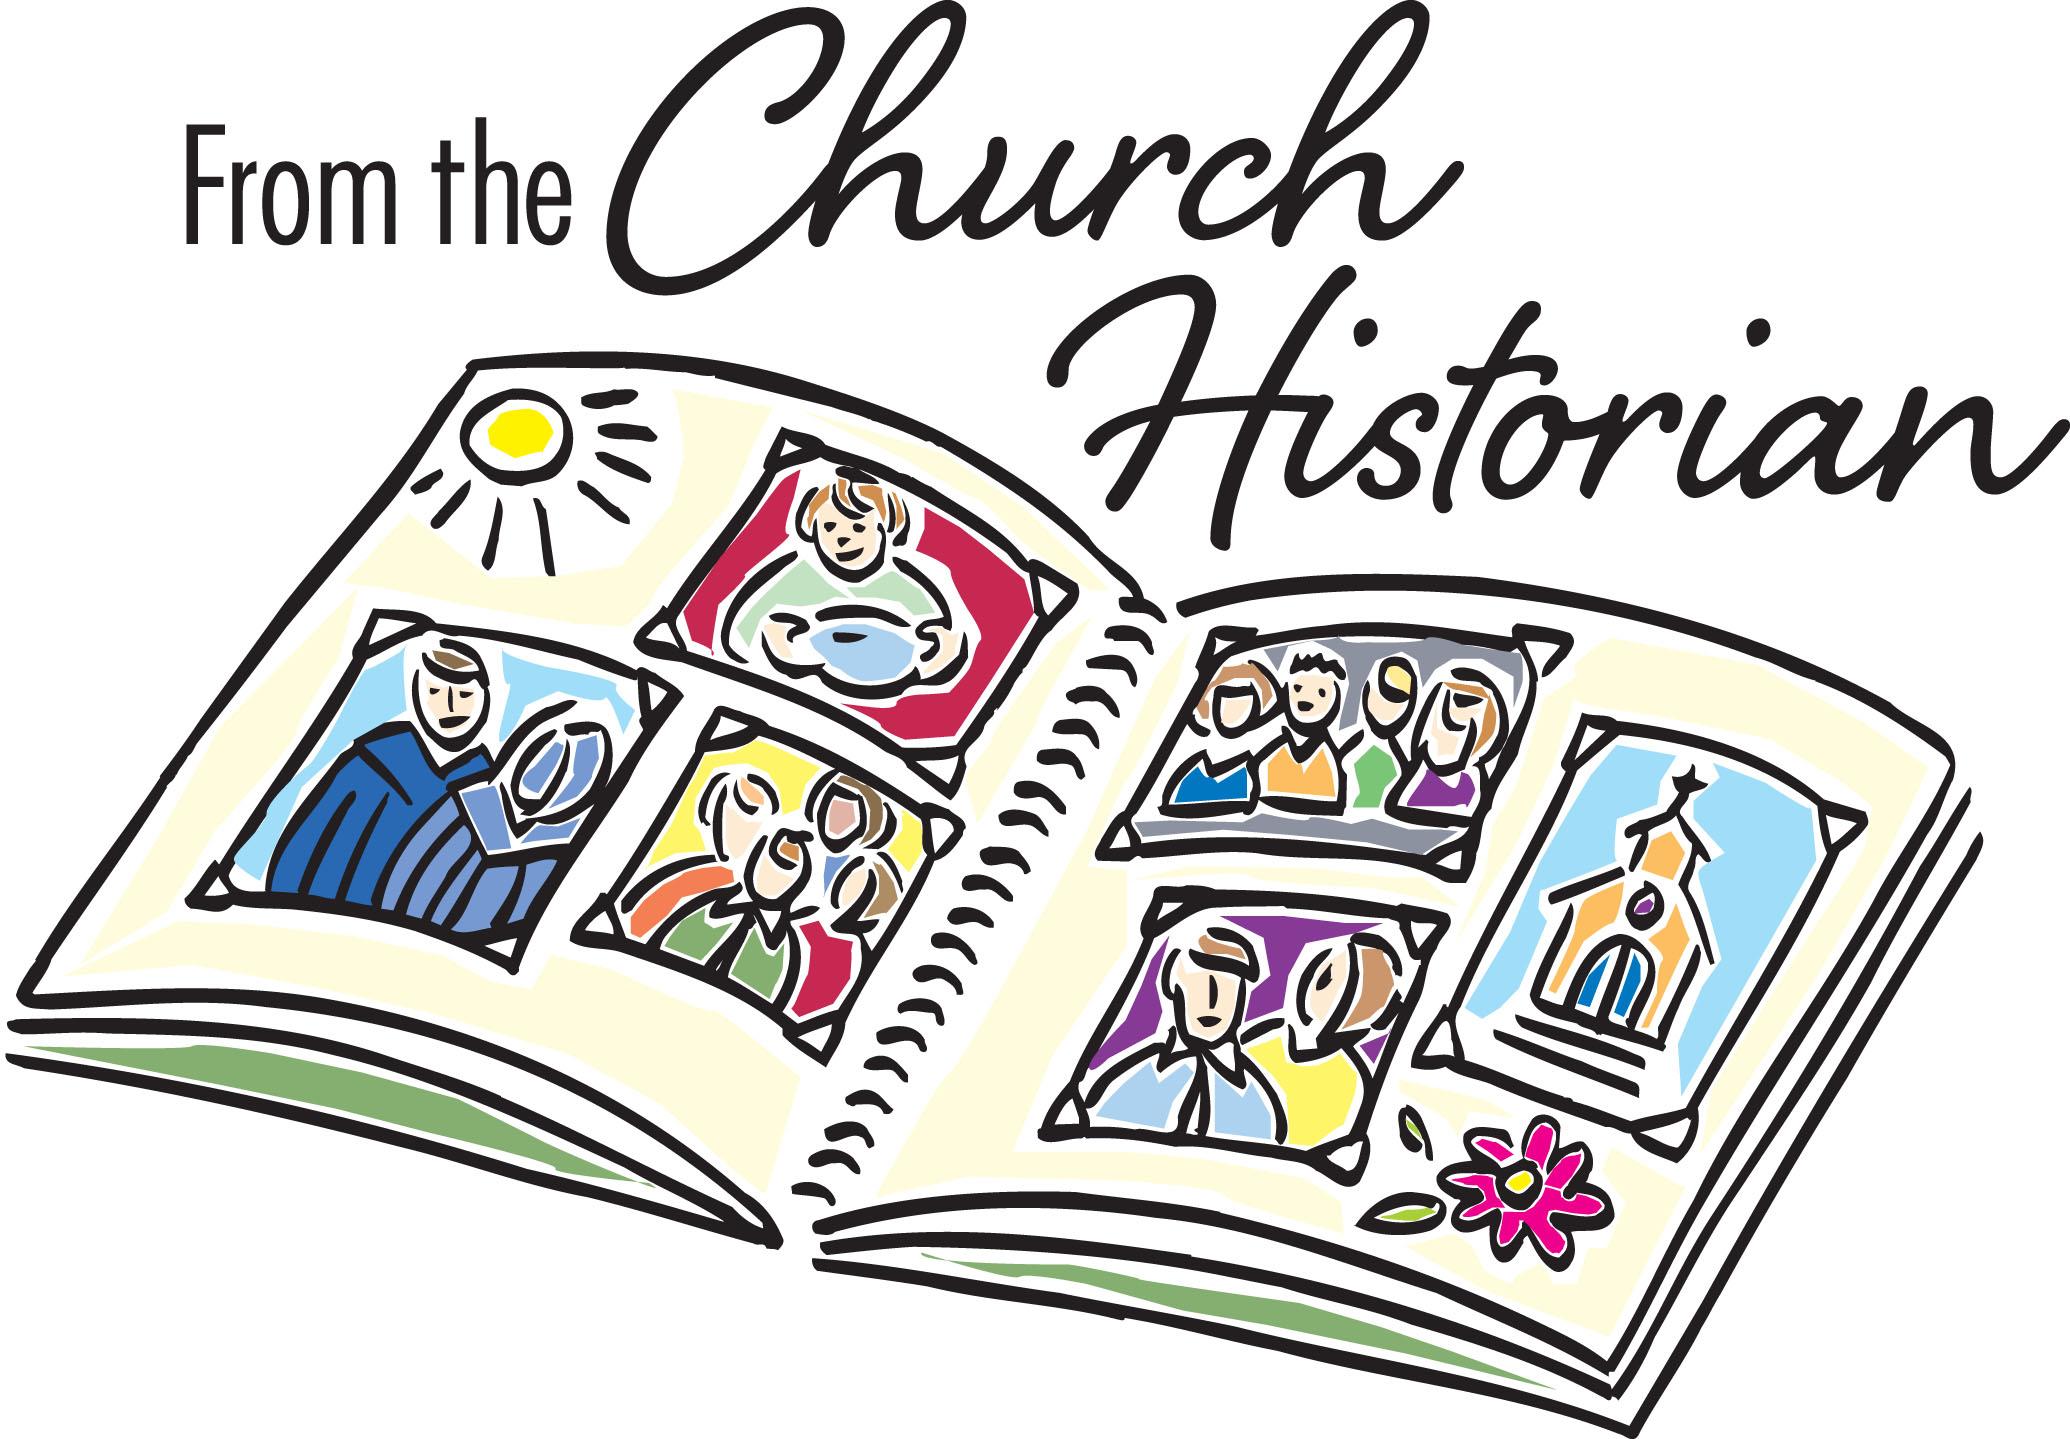 130 Years of History! - Church Historian: Sue Stewart